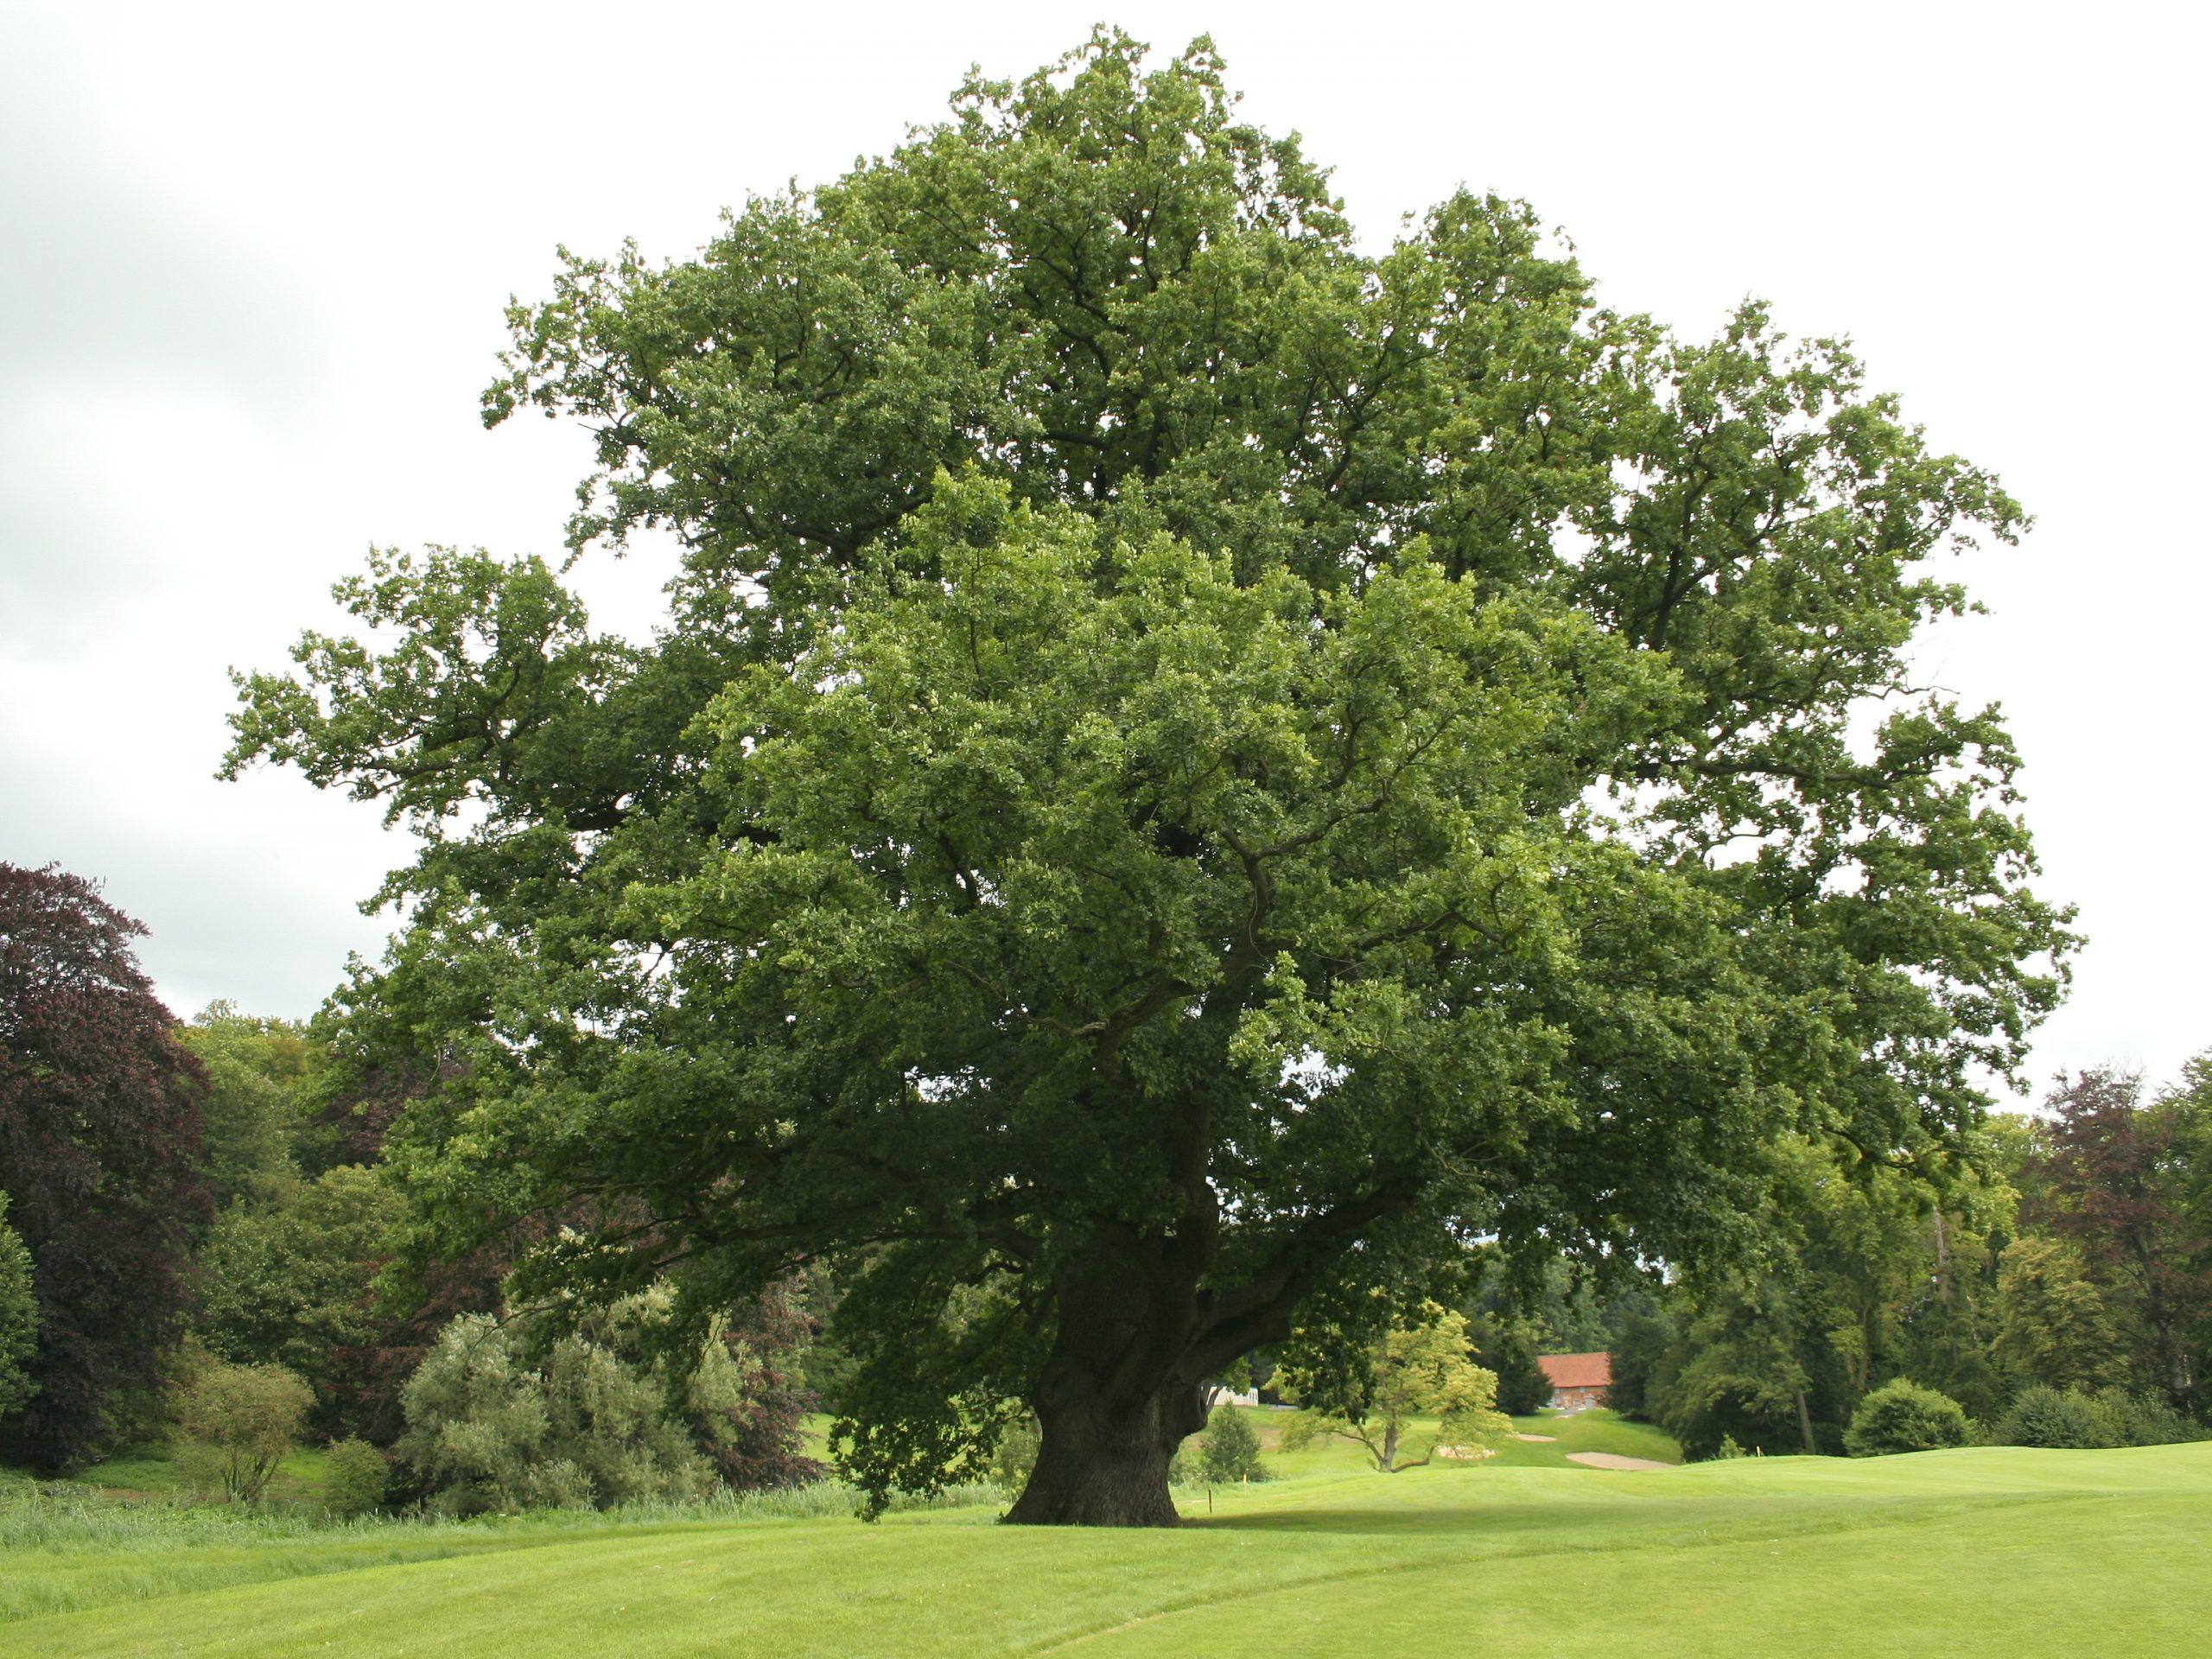 Mature English oak: Quercus robur wiki image